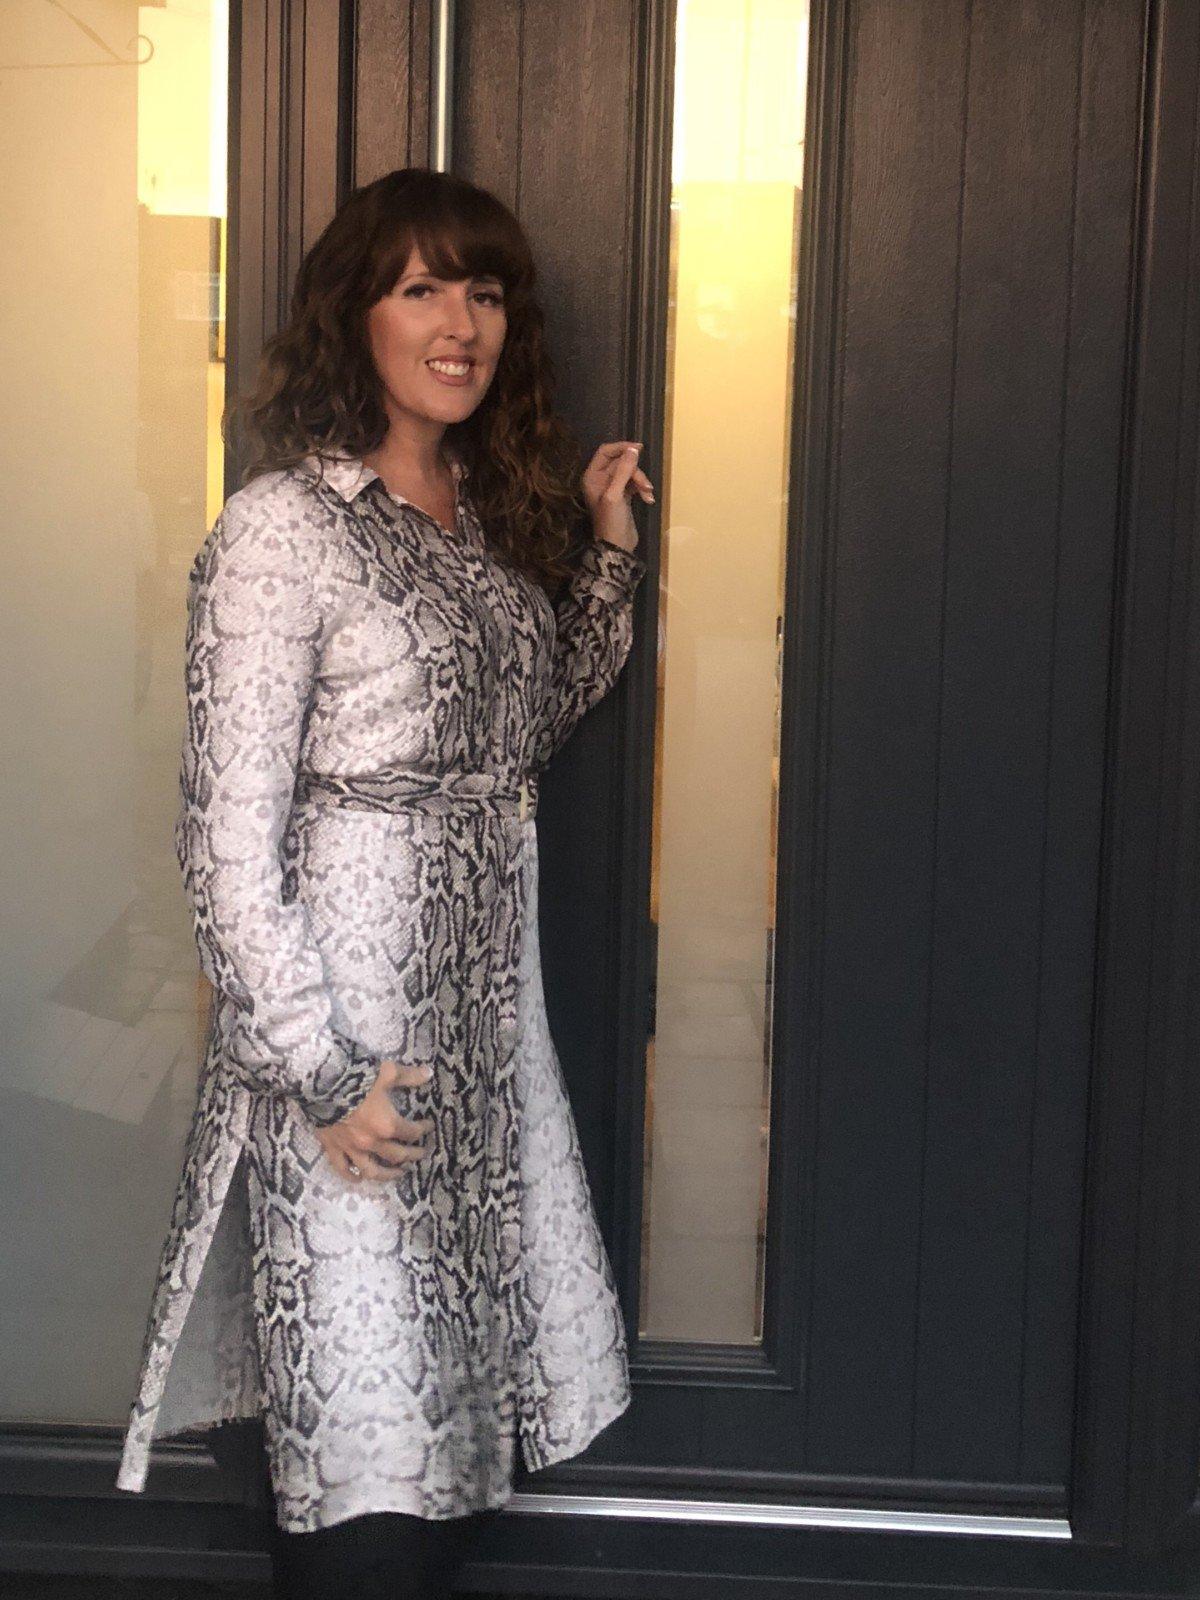 F and F snakeskin dress